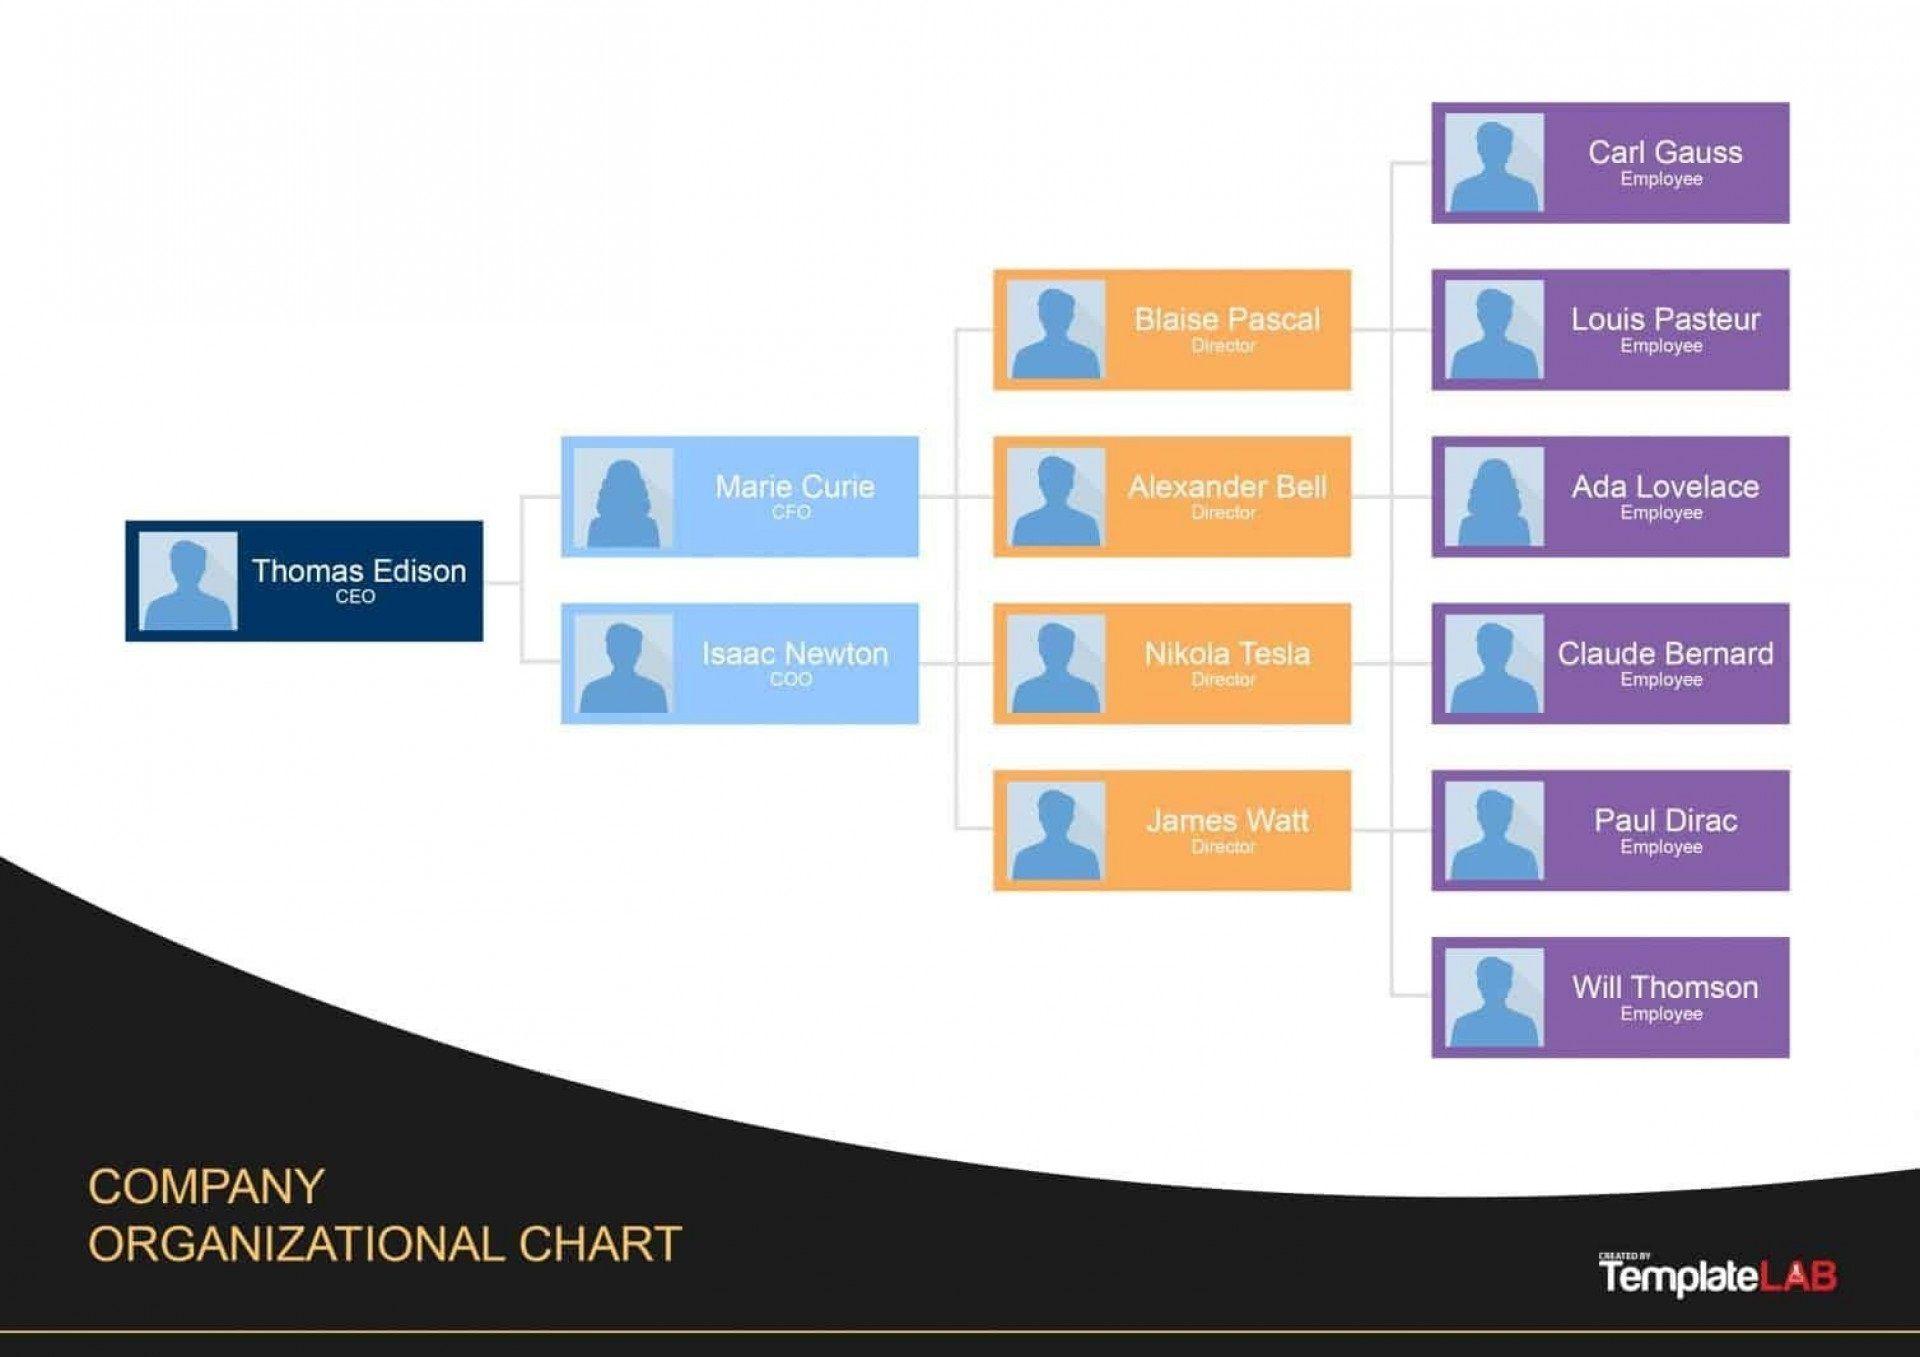 008 Marvelou Organization Chart Template Word 2013 Inspiration  Organizational Free In MicrosoftFull